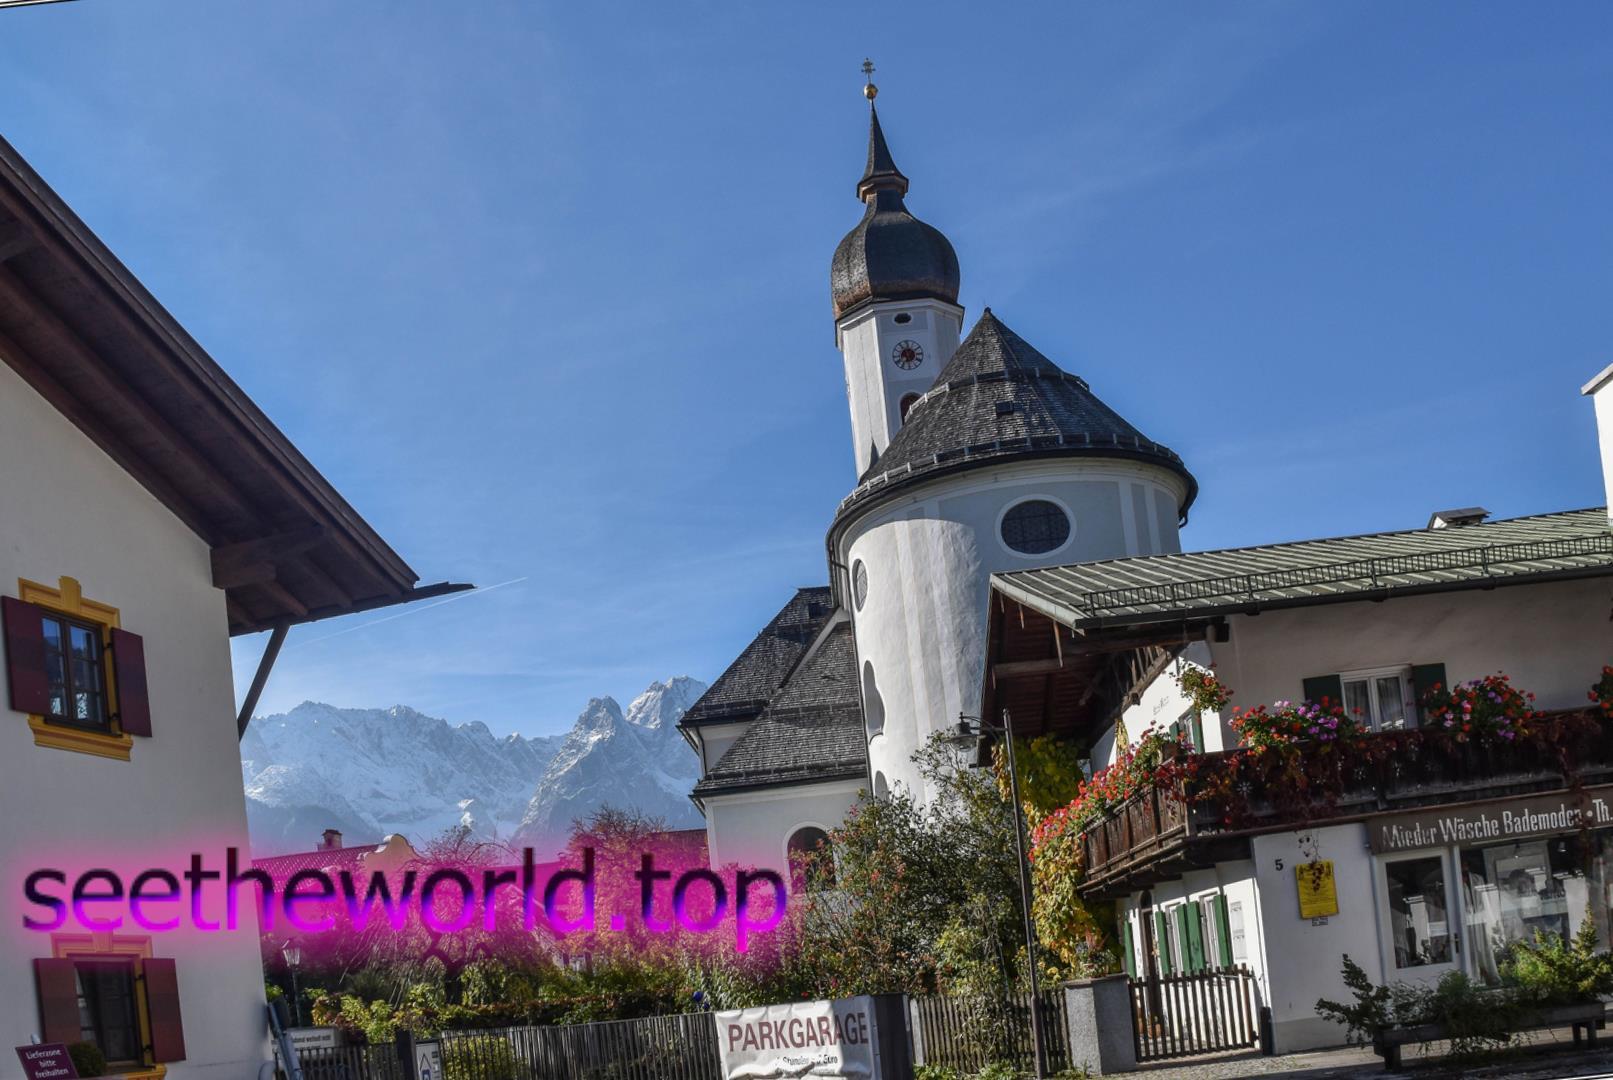 Гірськолижний курорт Гарміш-Партенкірхен (Garmisch-Partenkirchen), Німеччина